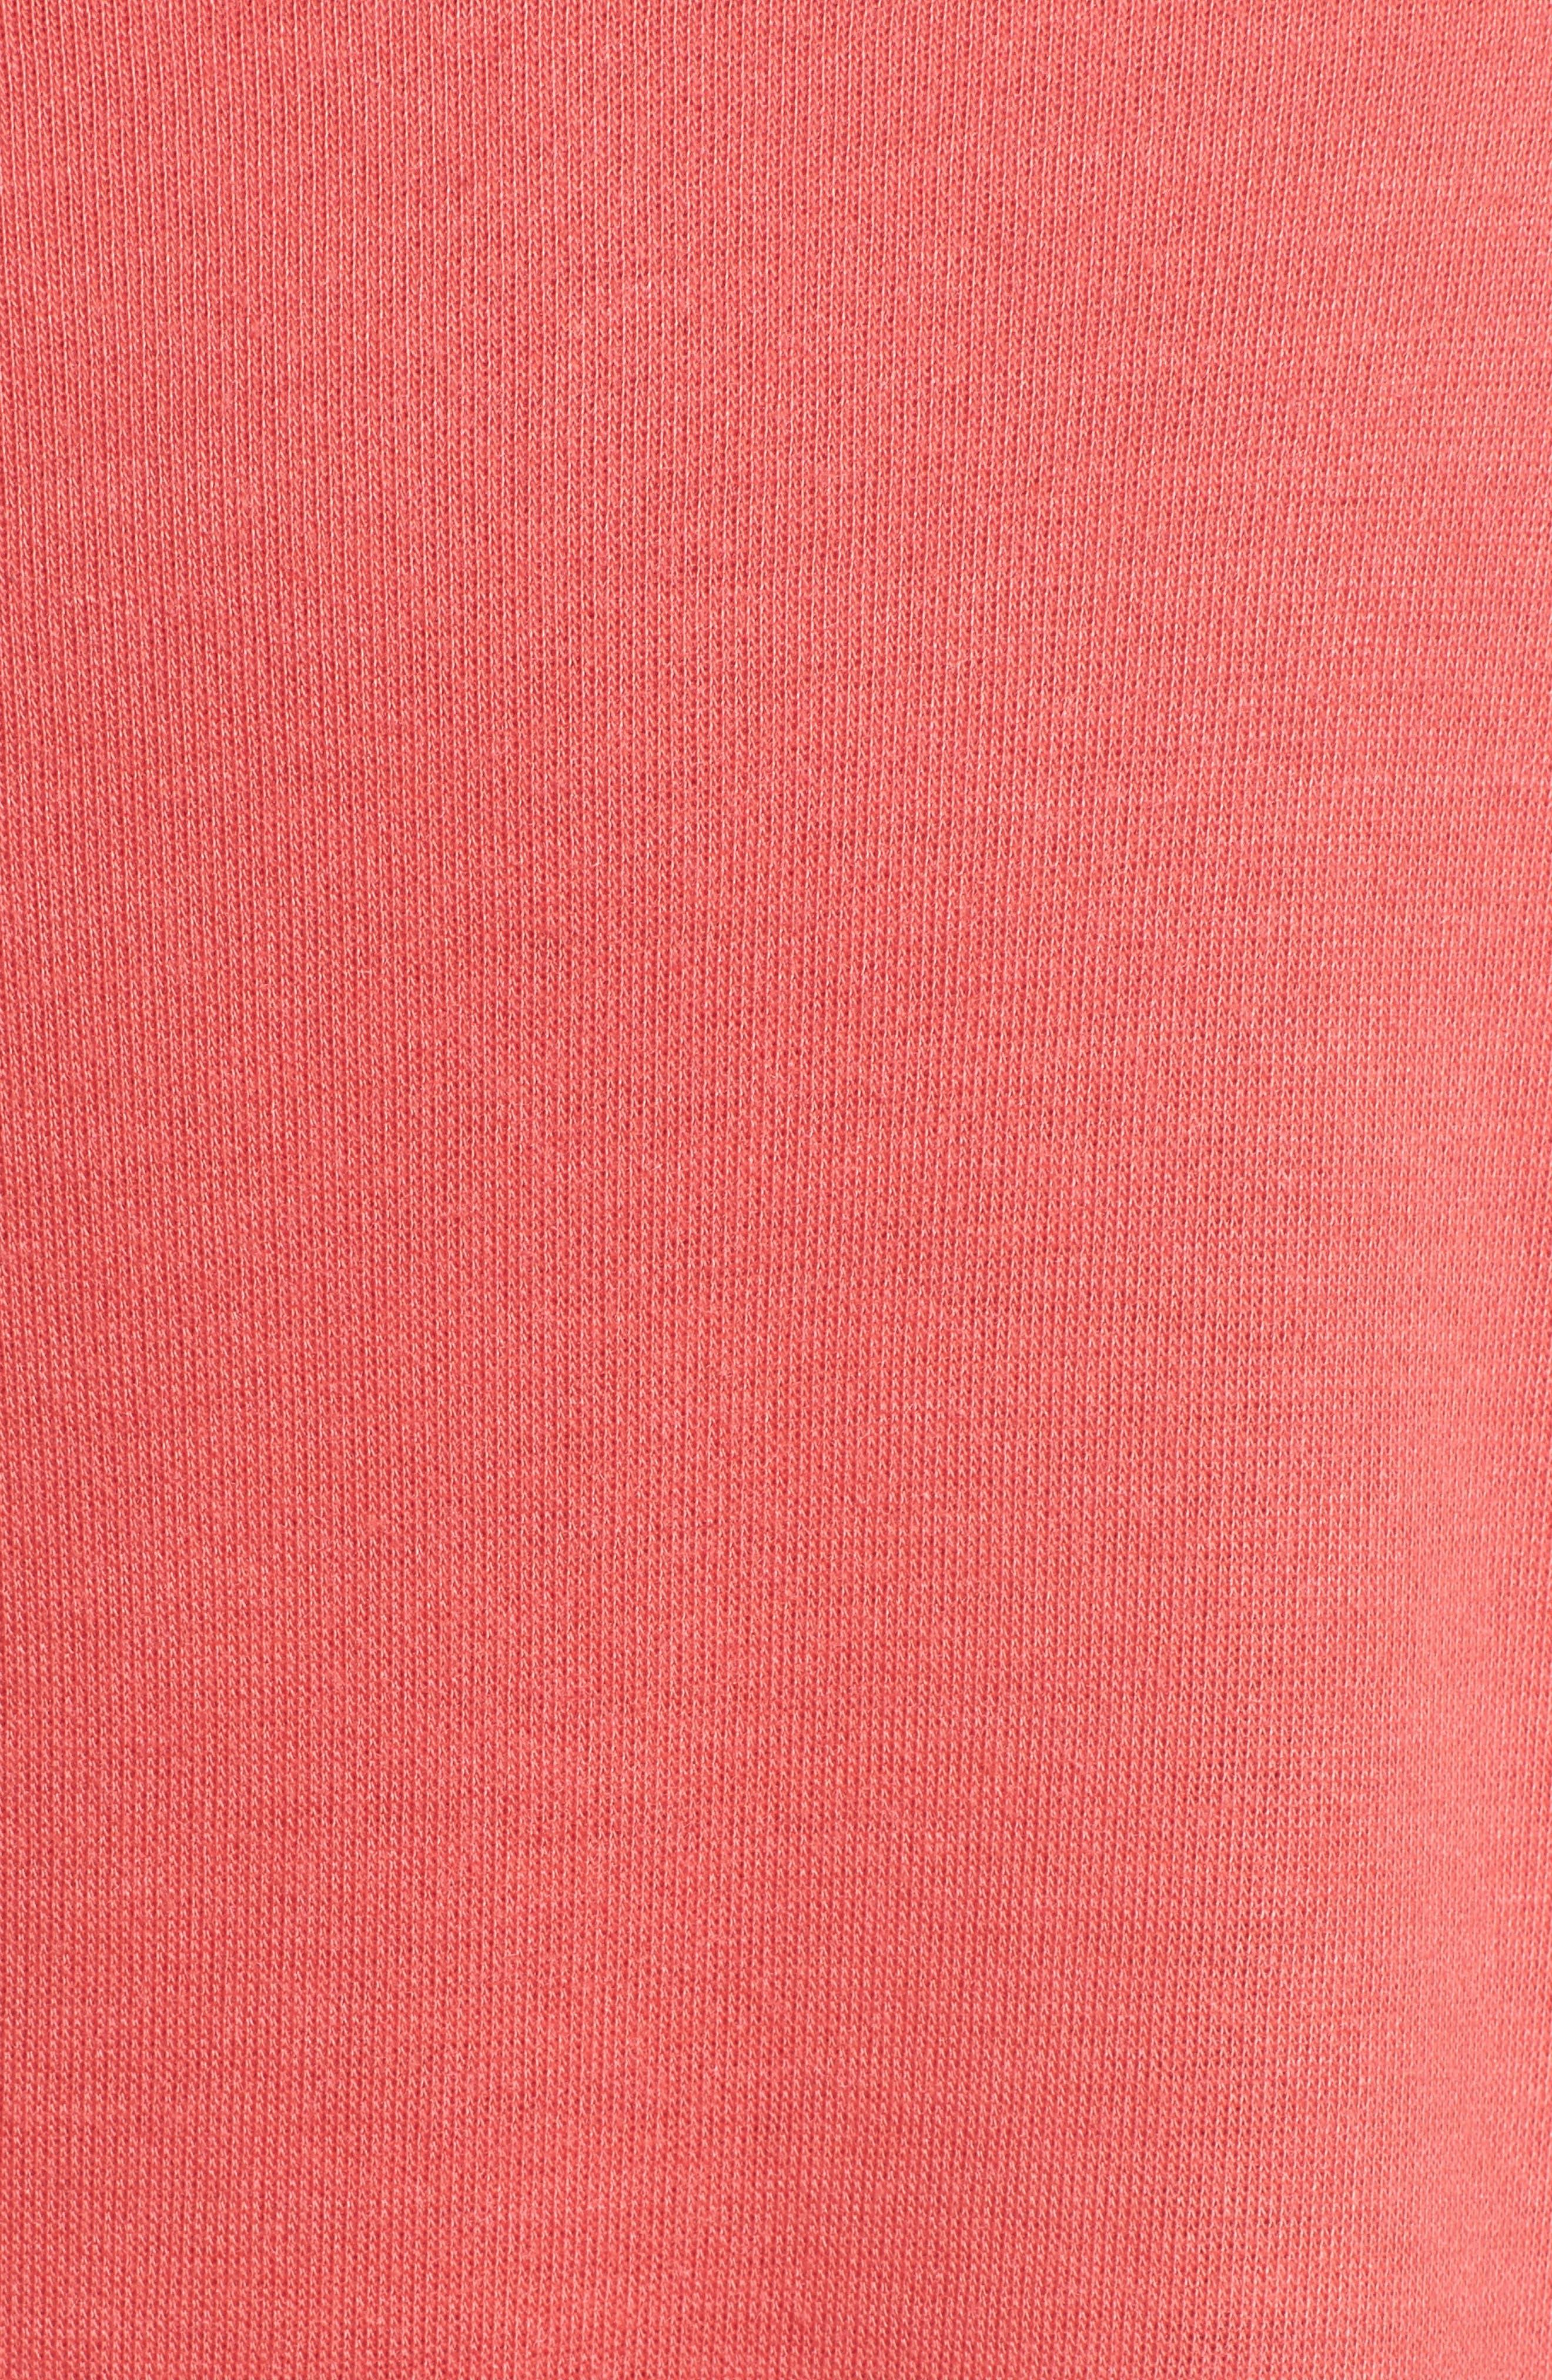 Bateau Neck Knit Tunic,                             Alternate thumbnail 5, color,                             Coral Sea